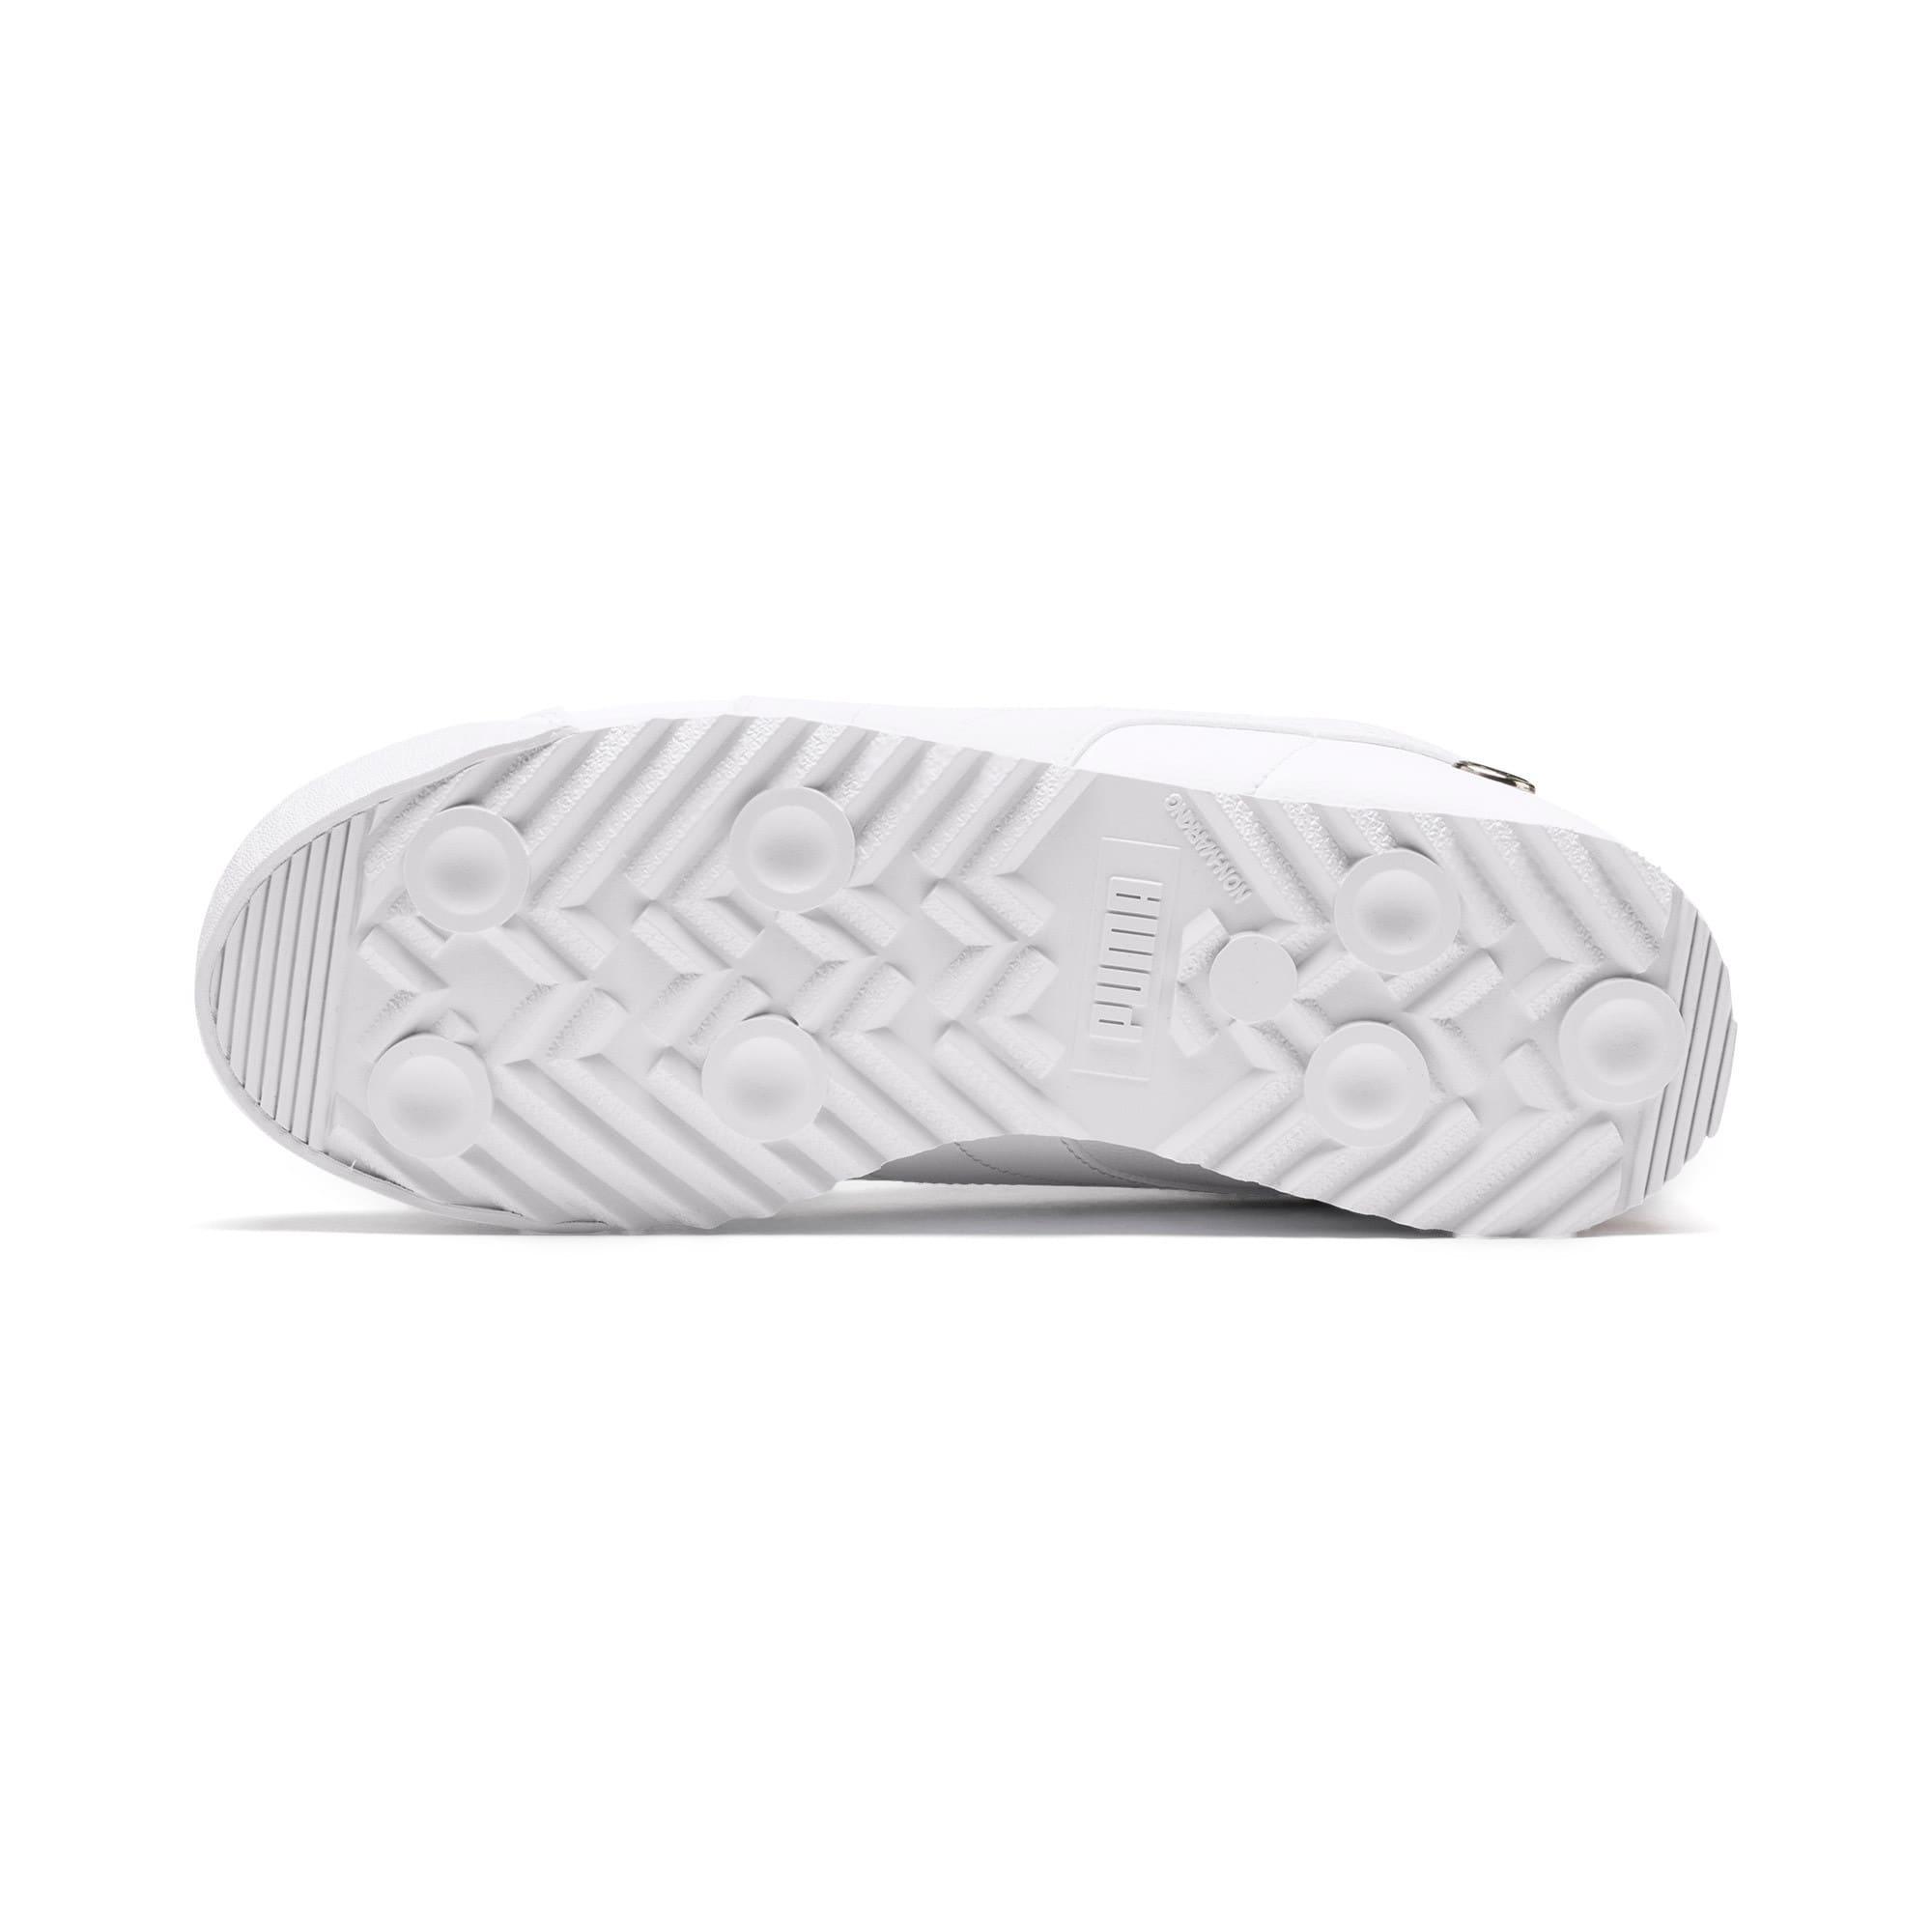 Thumbnail 3 of BMW M Motorsport Roma Sneakers JR, Puma White-Puma White, medium